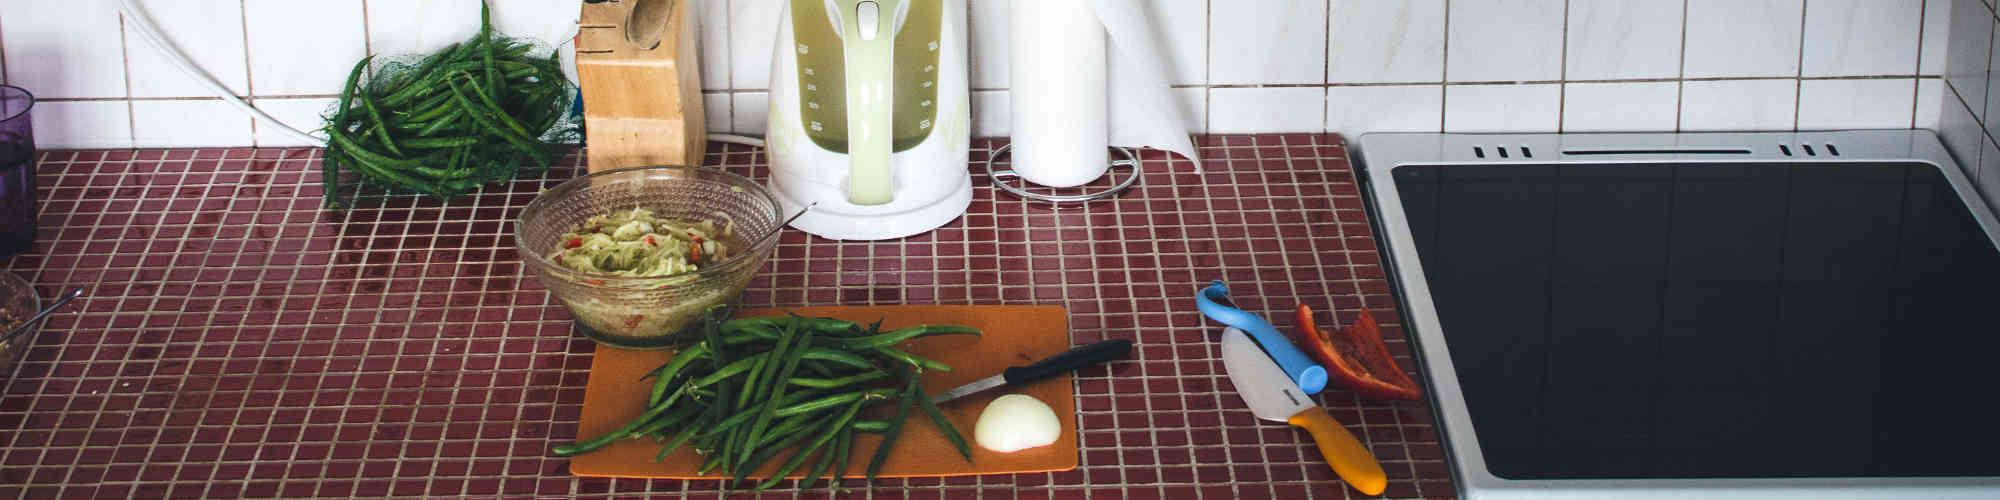 https://s3.amazonaws.com/ka-images-prod/mastheads/home-vintage-kitchen-2.jpg